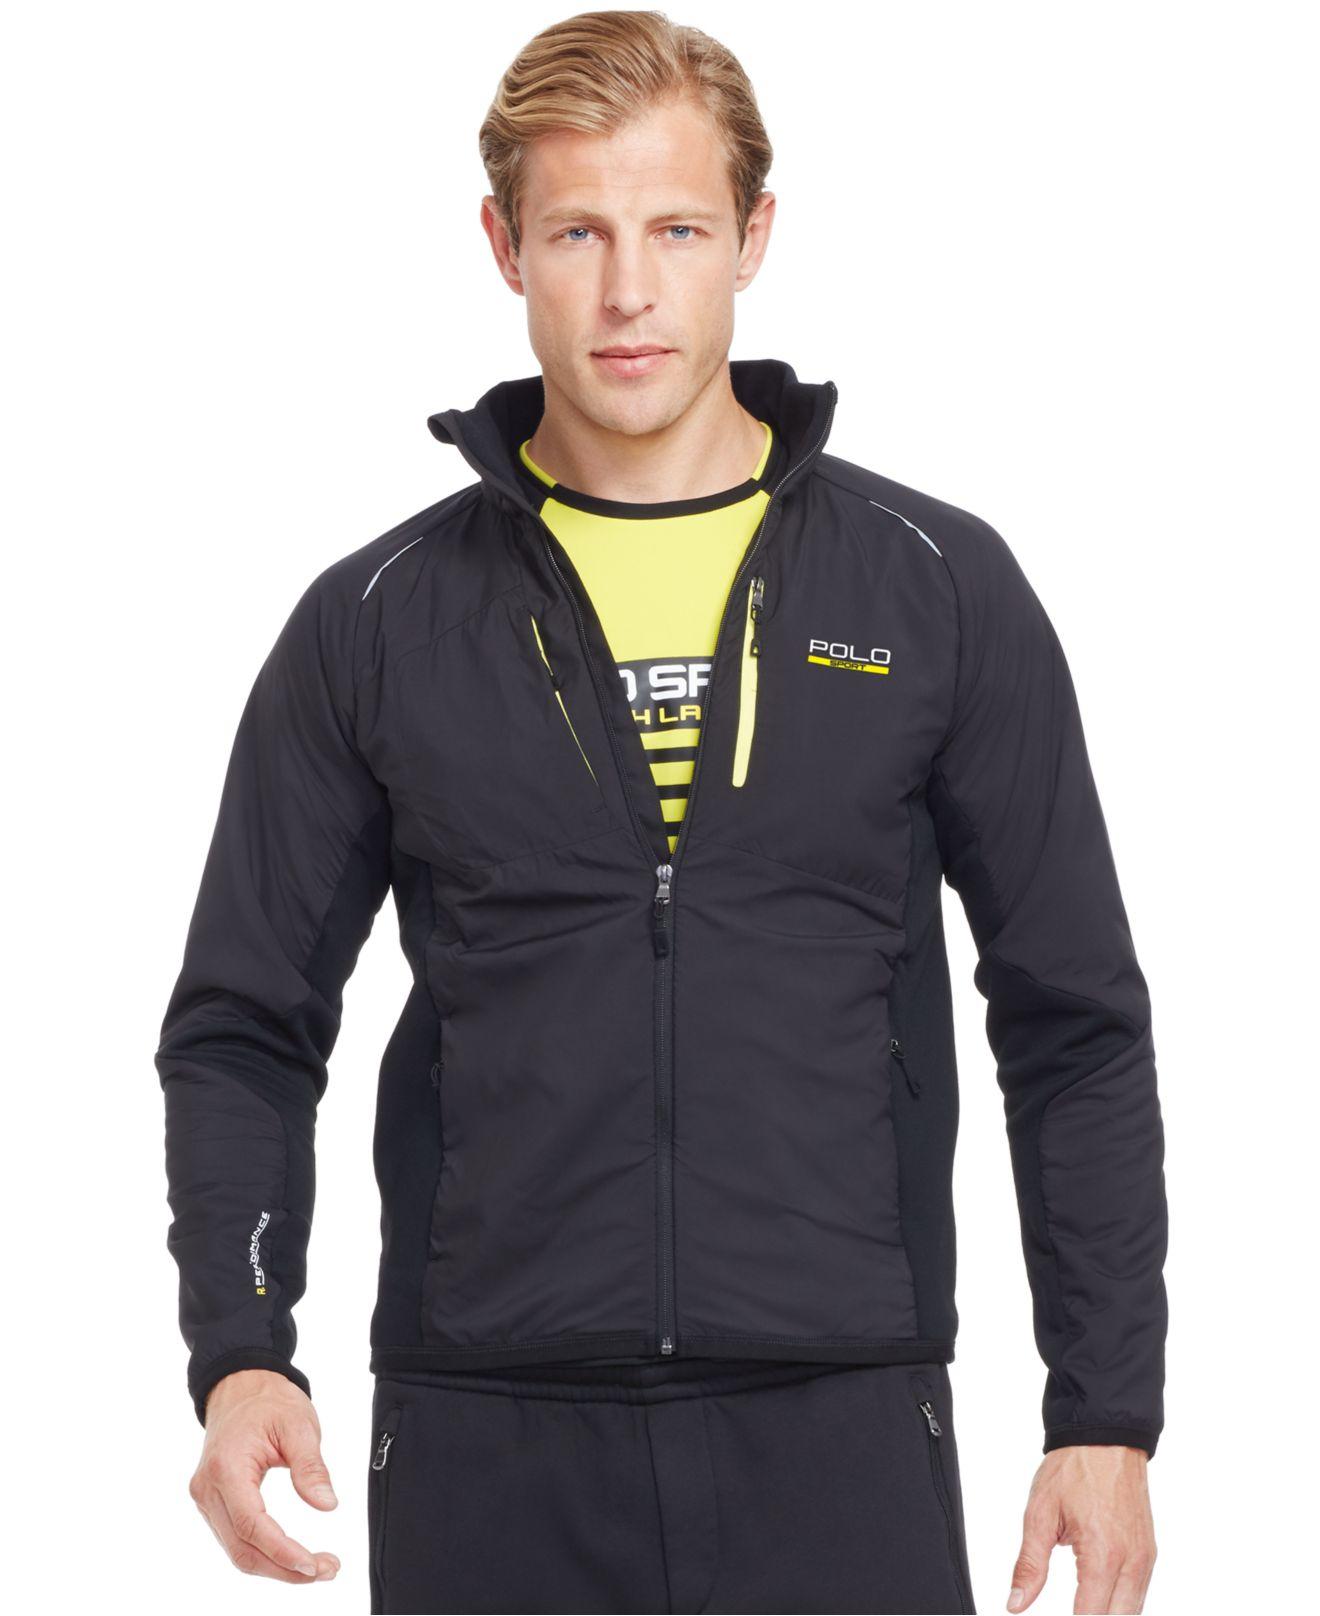 polo ralph lauren polo sport hybrid tech jacket in black. Black Bedroom Furniture Sets. Home Design Ideas